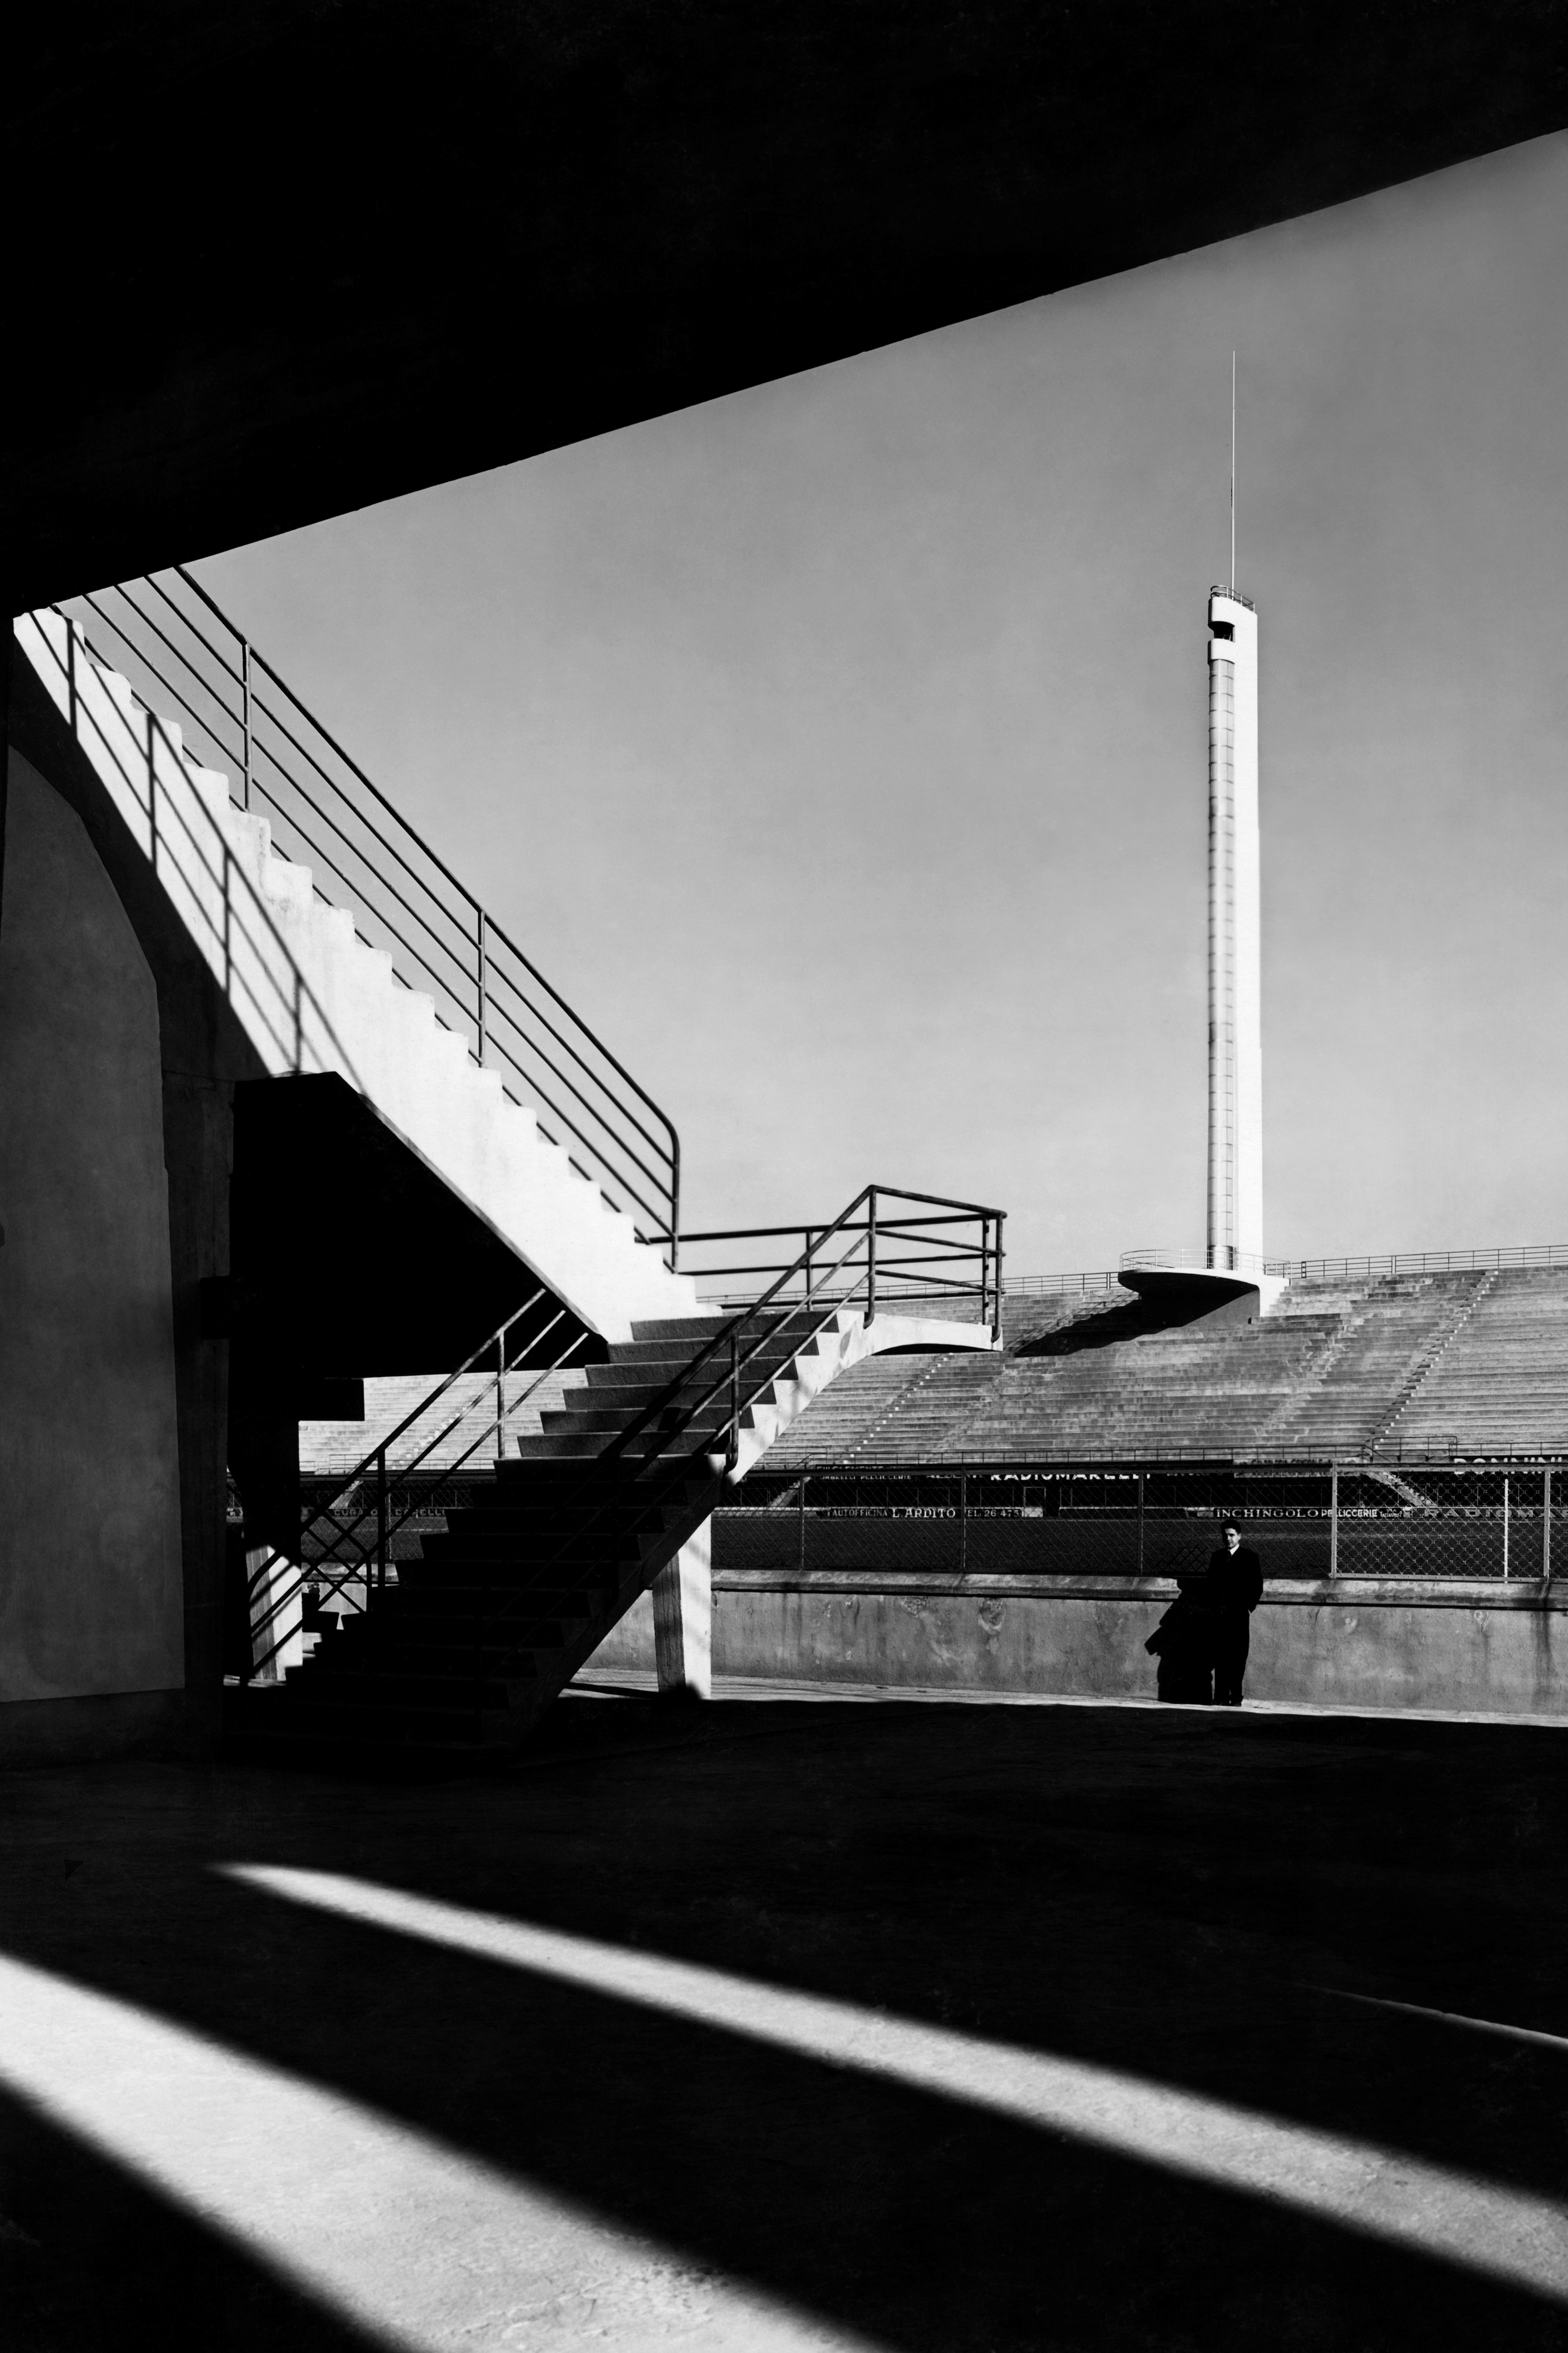 Torre di maratona, giovanni berta stadium, florence 30s